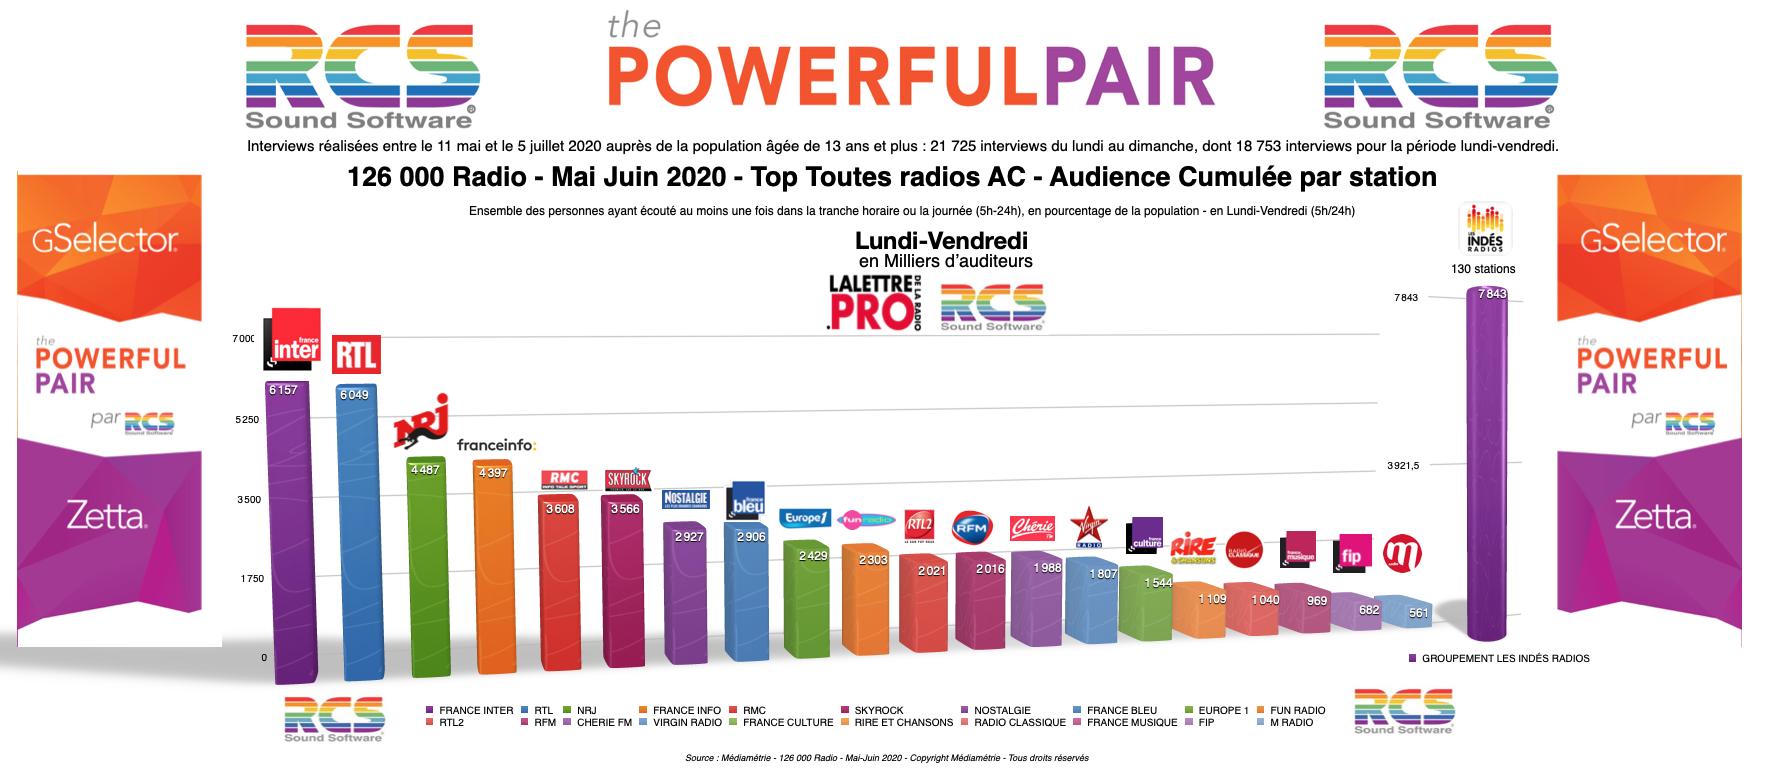 Diagramme exclusif LLP/RCS - TOP radios  en Lundi-Vendredi - 126 000  Mai-Juin 2020